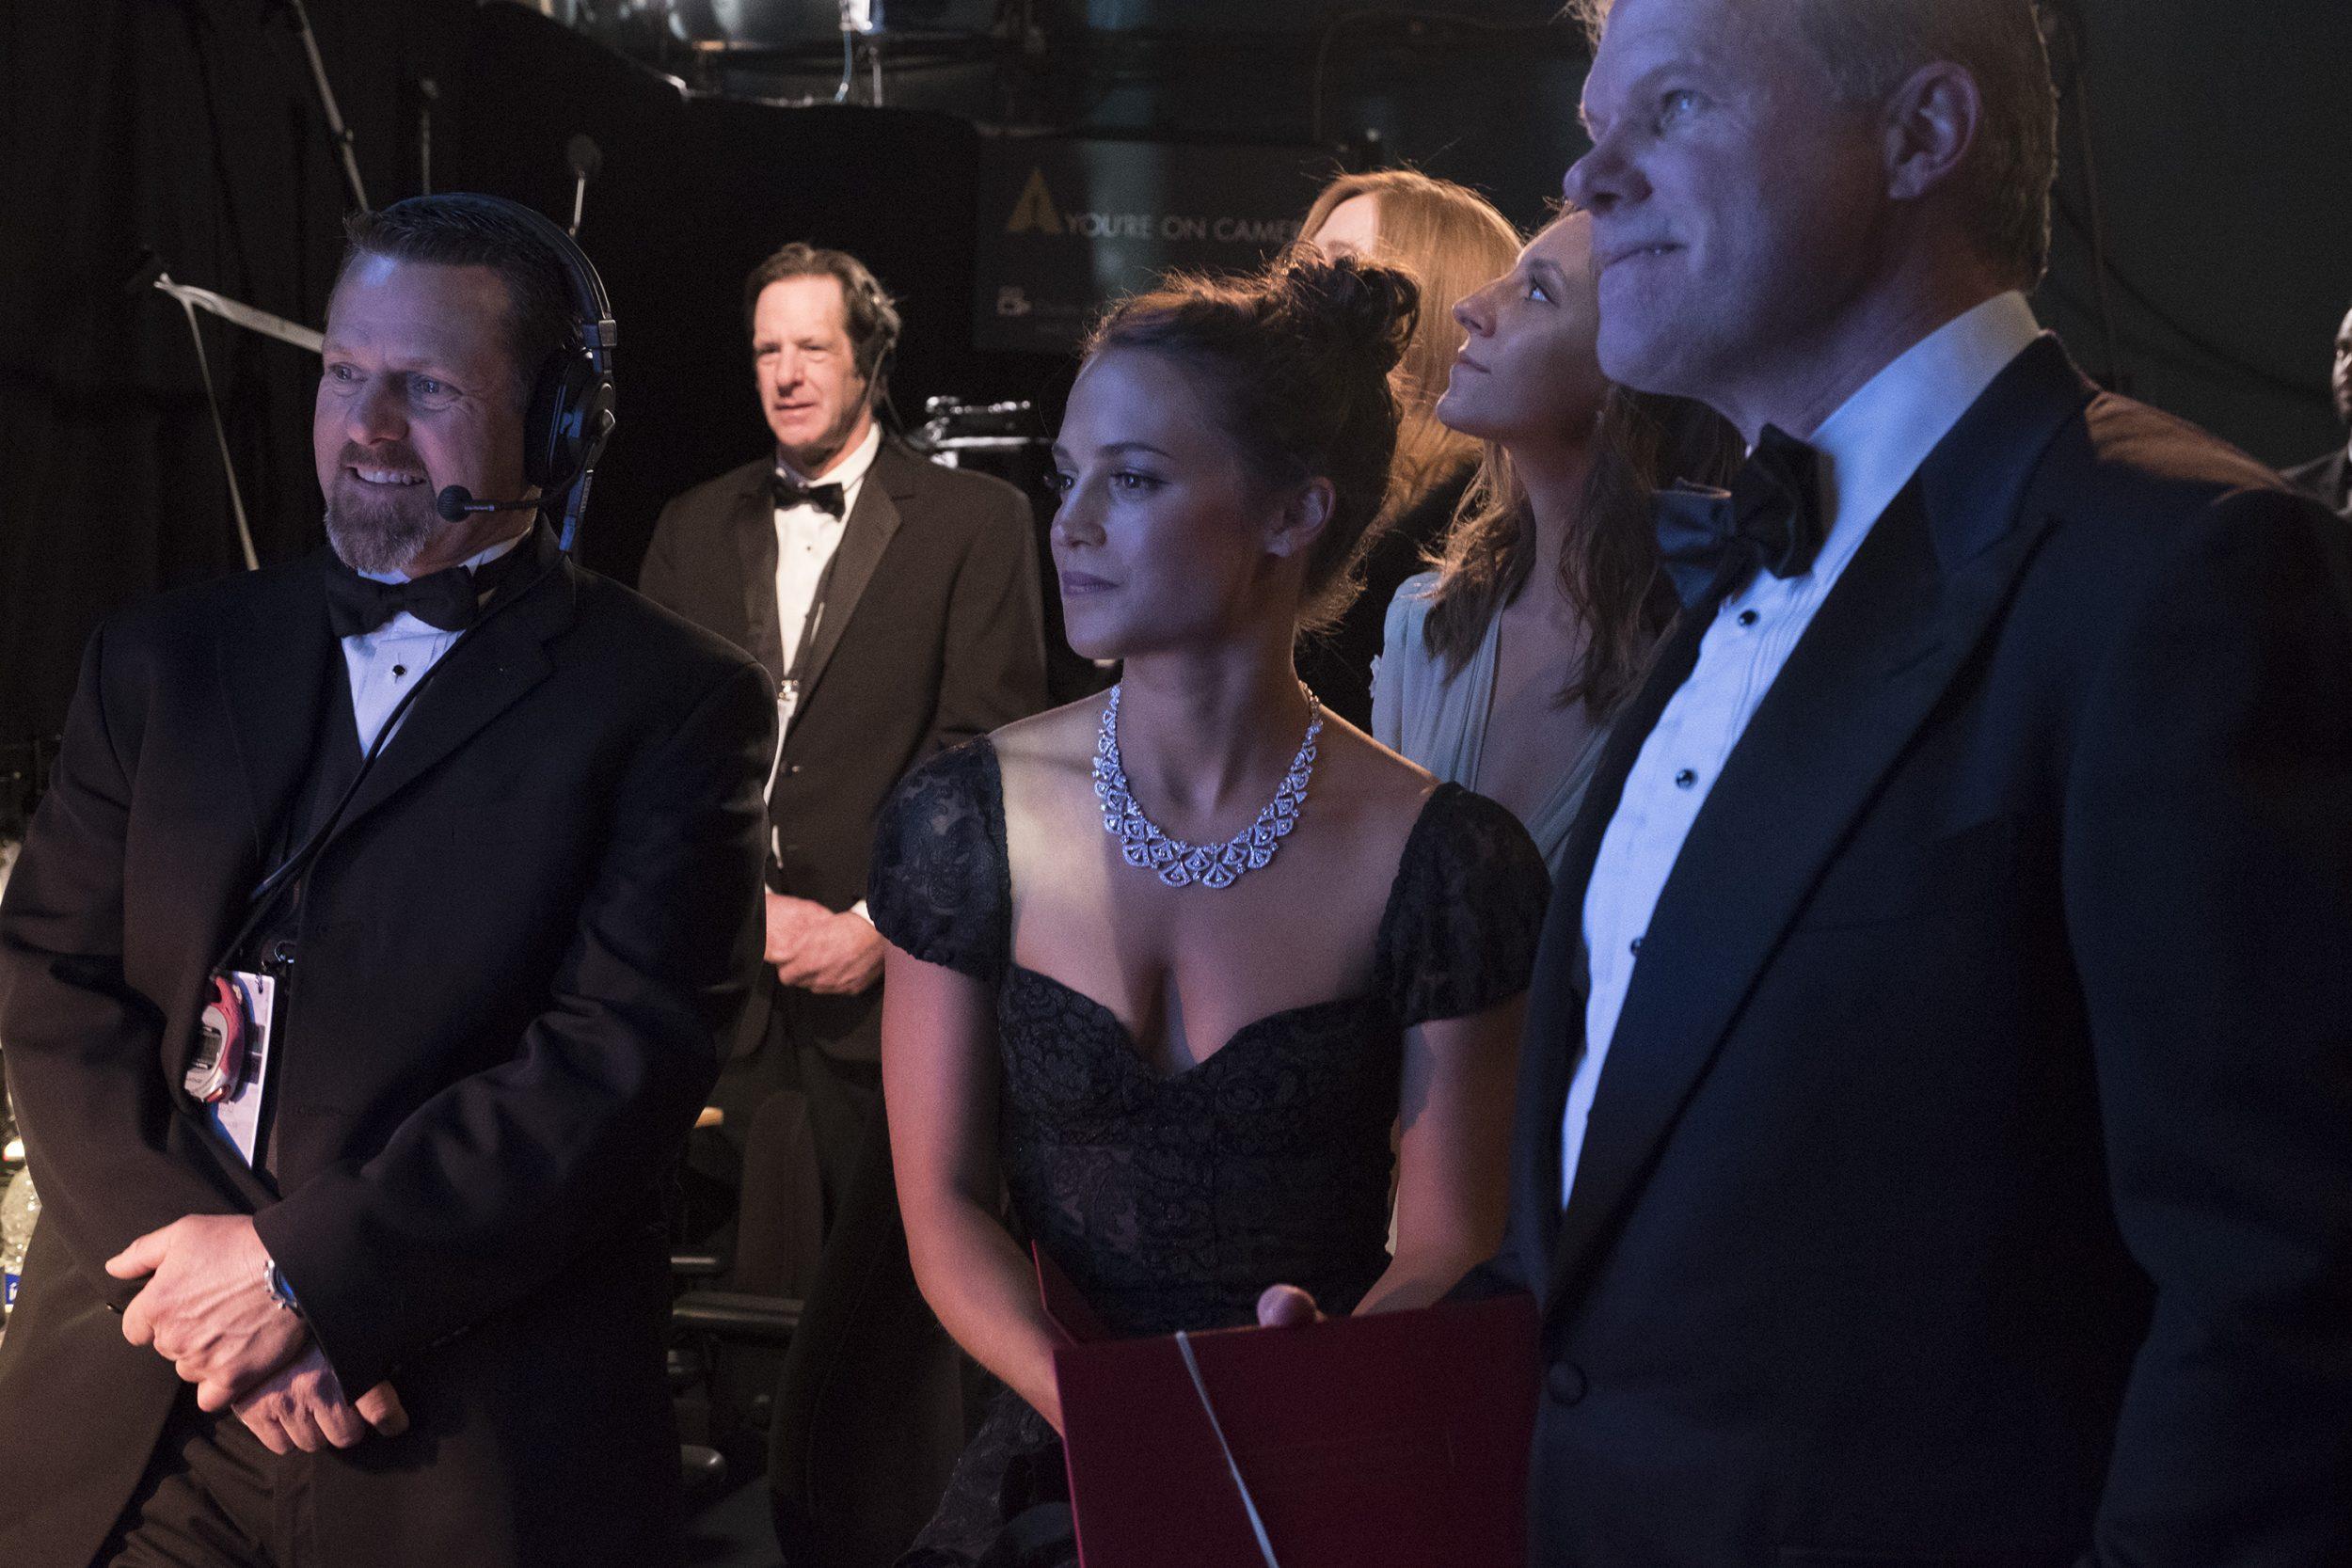 THE OSCARS(r) - The 89th Oscars(r)  broadcasts live on Oscar(r) SUNDAY, FEBRUARY 26, 2017, on the ABC Television Network. (ABC/Adam Rose) ALICIA VIKANDER